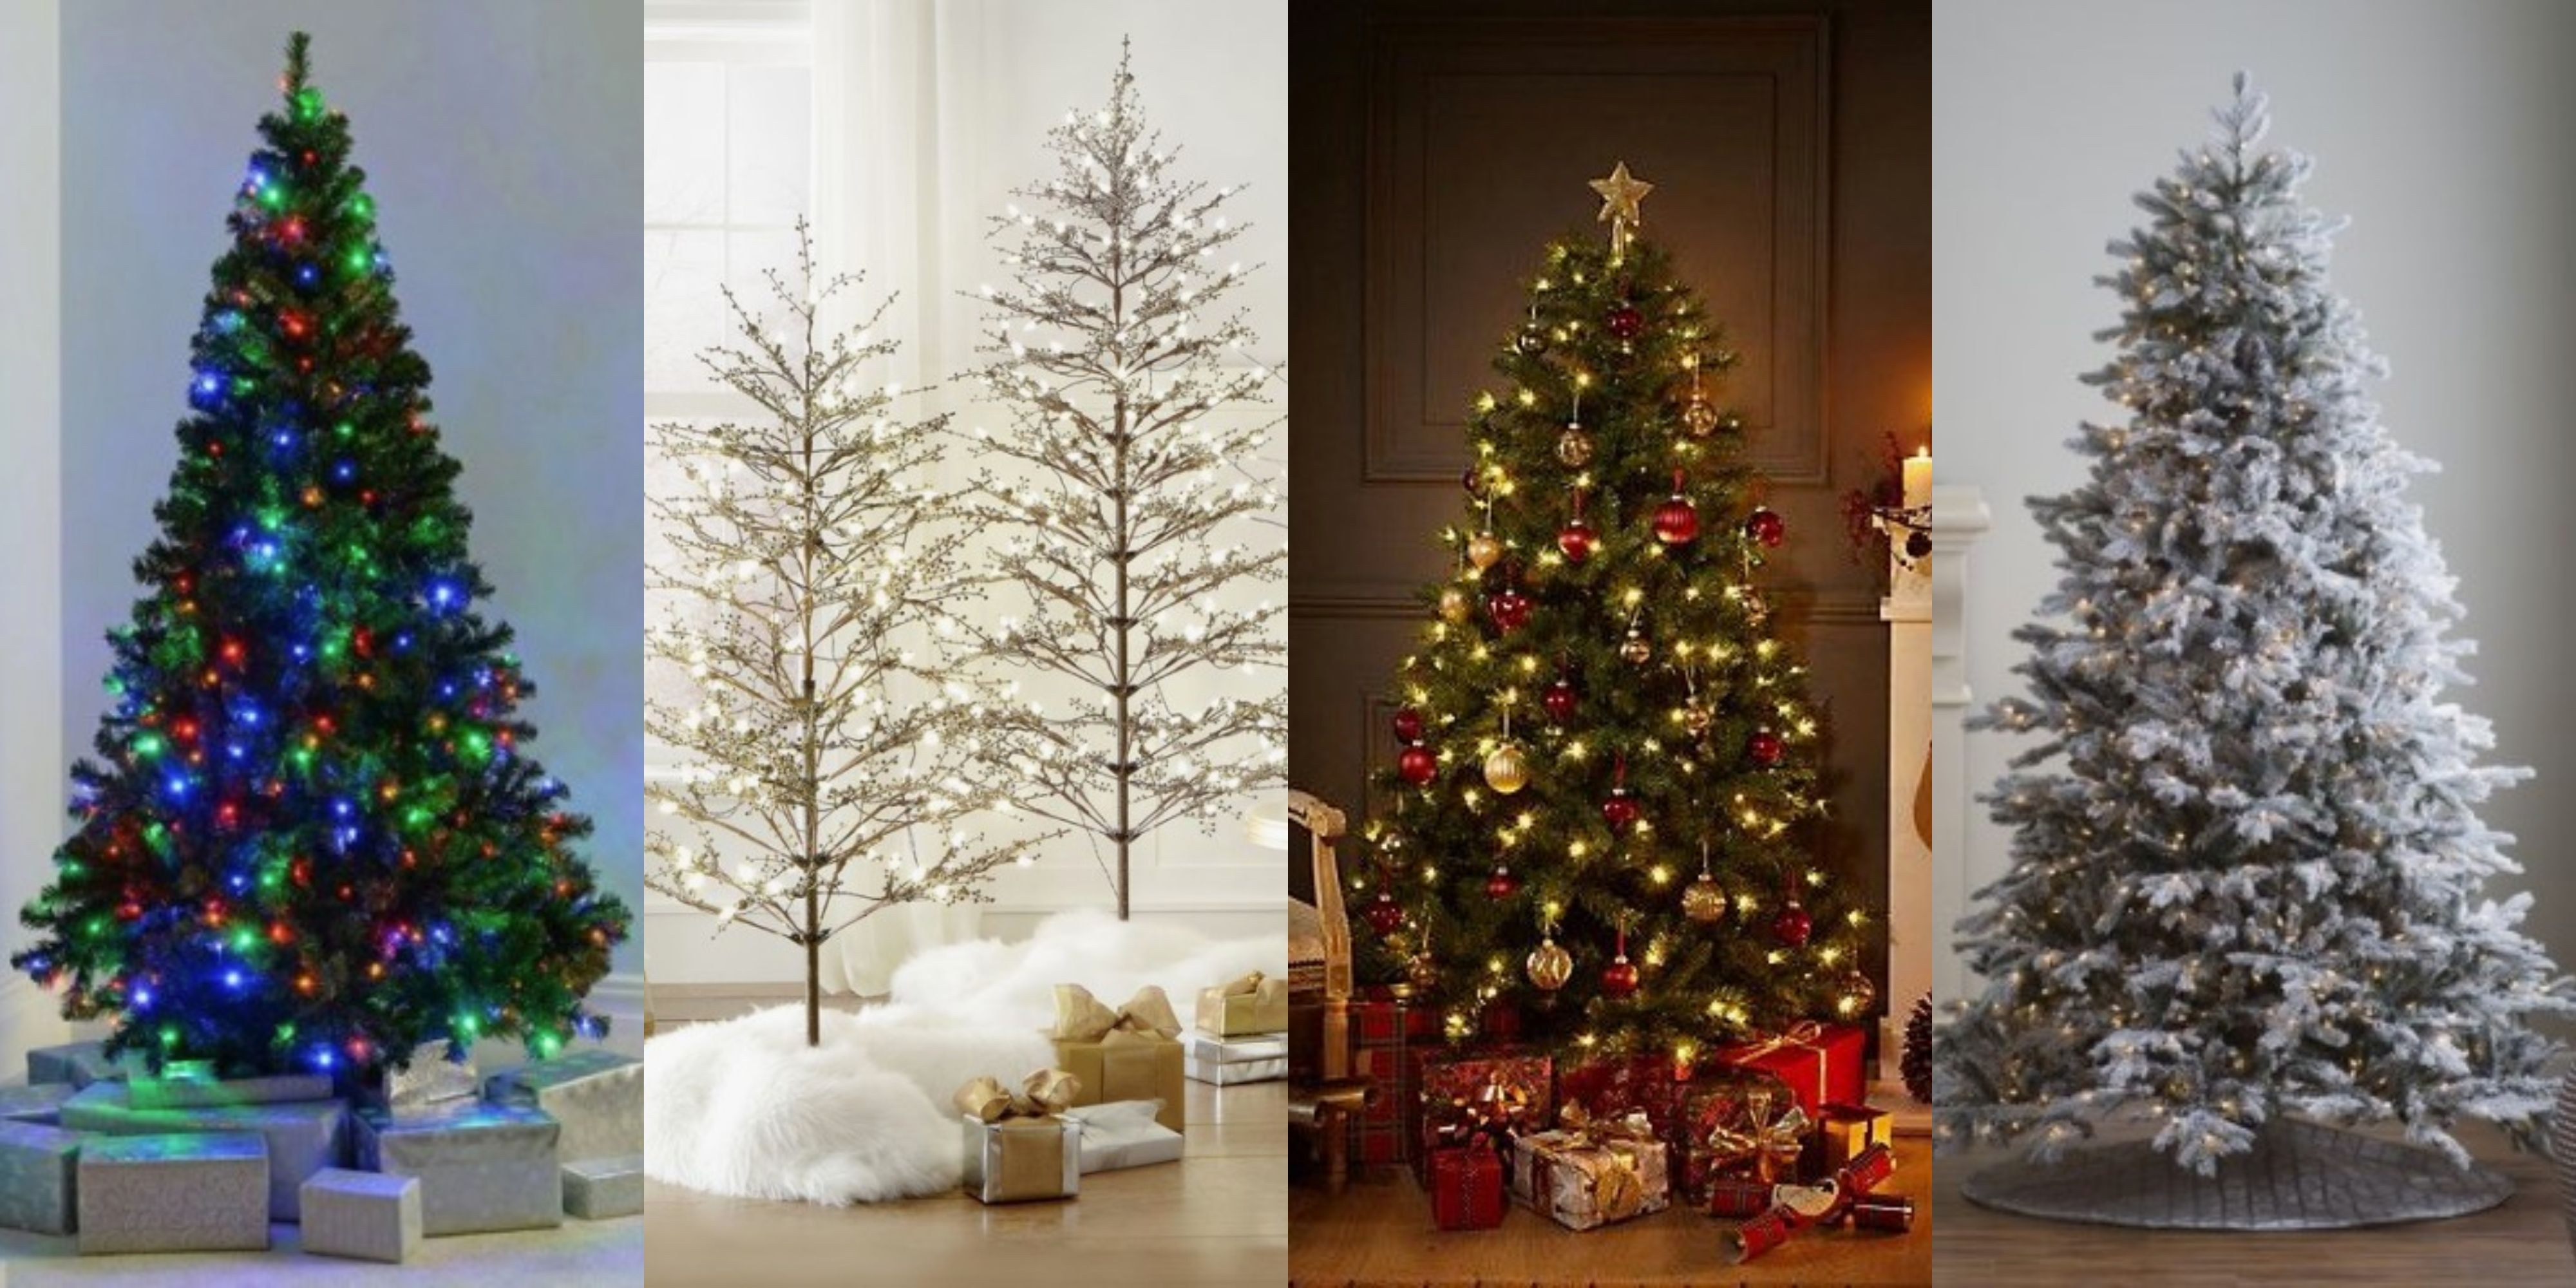 pinterest-pre-lit-christmas-trees-153554